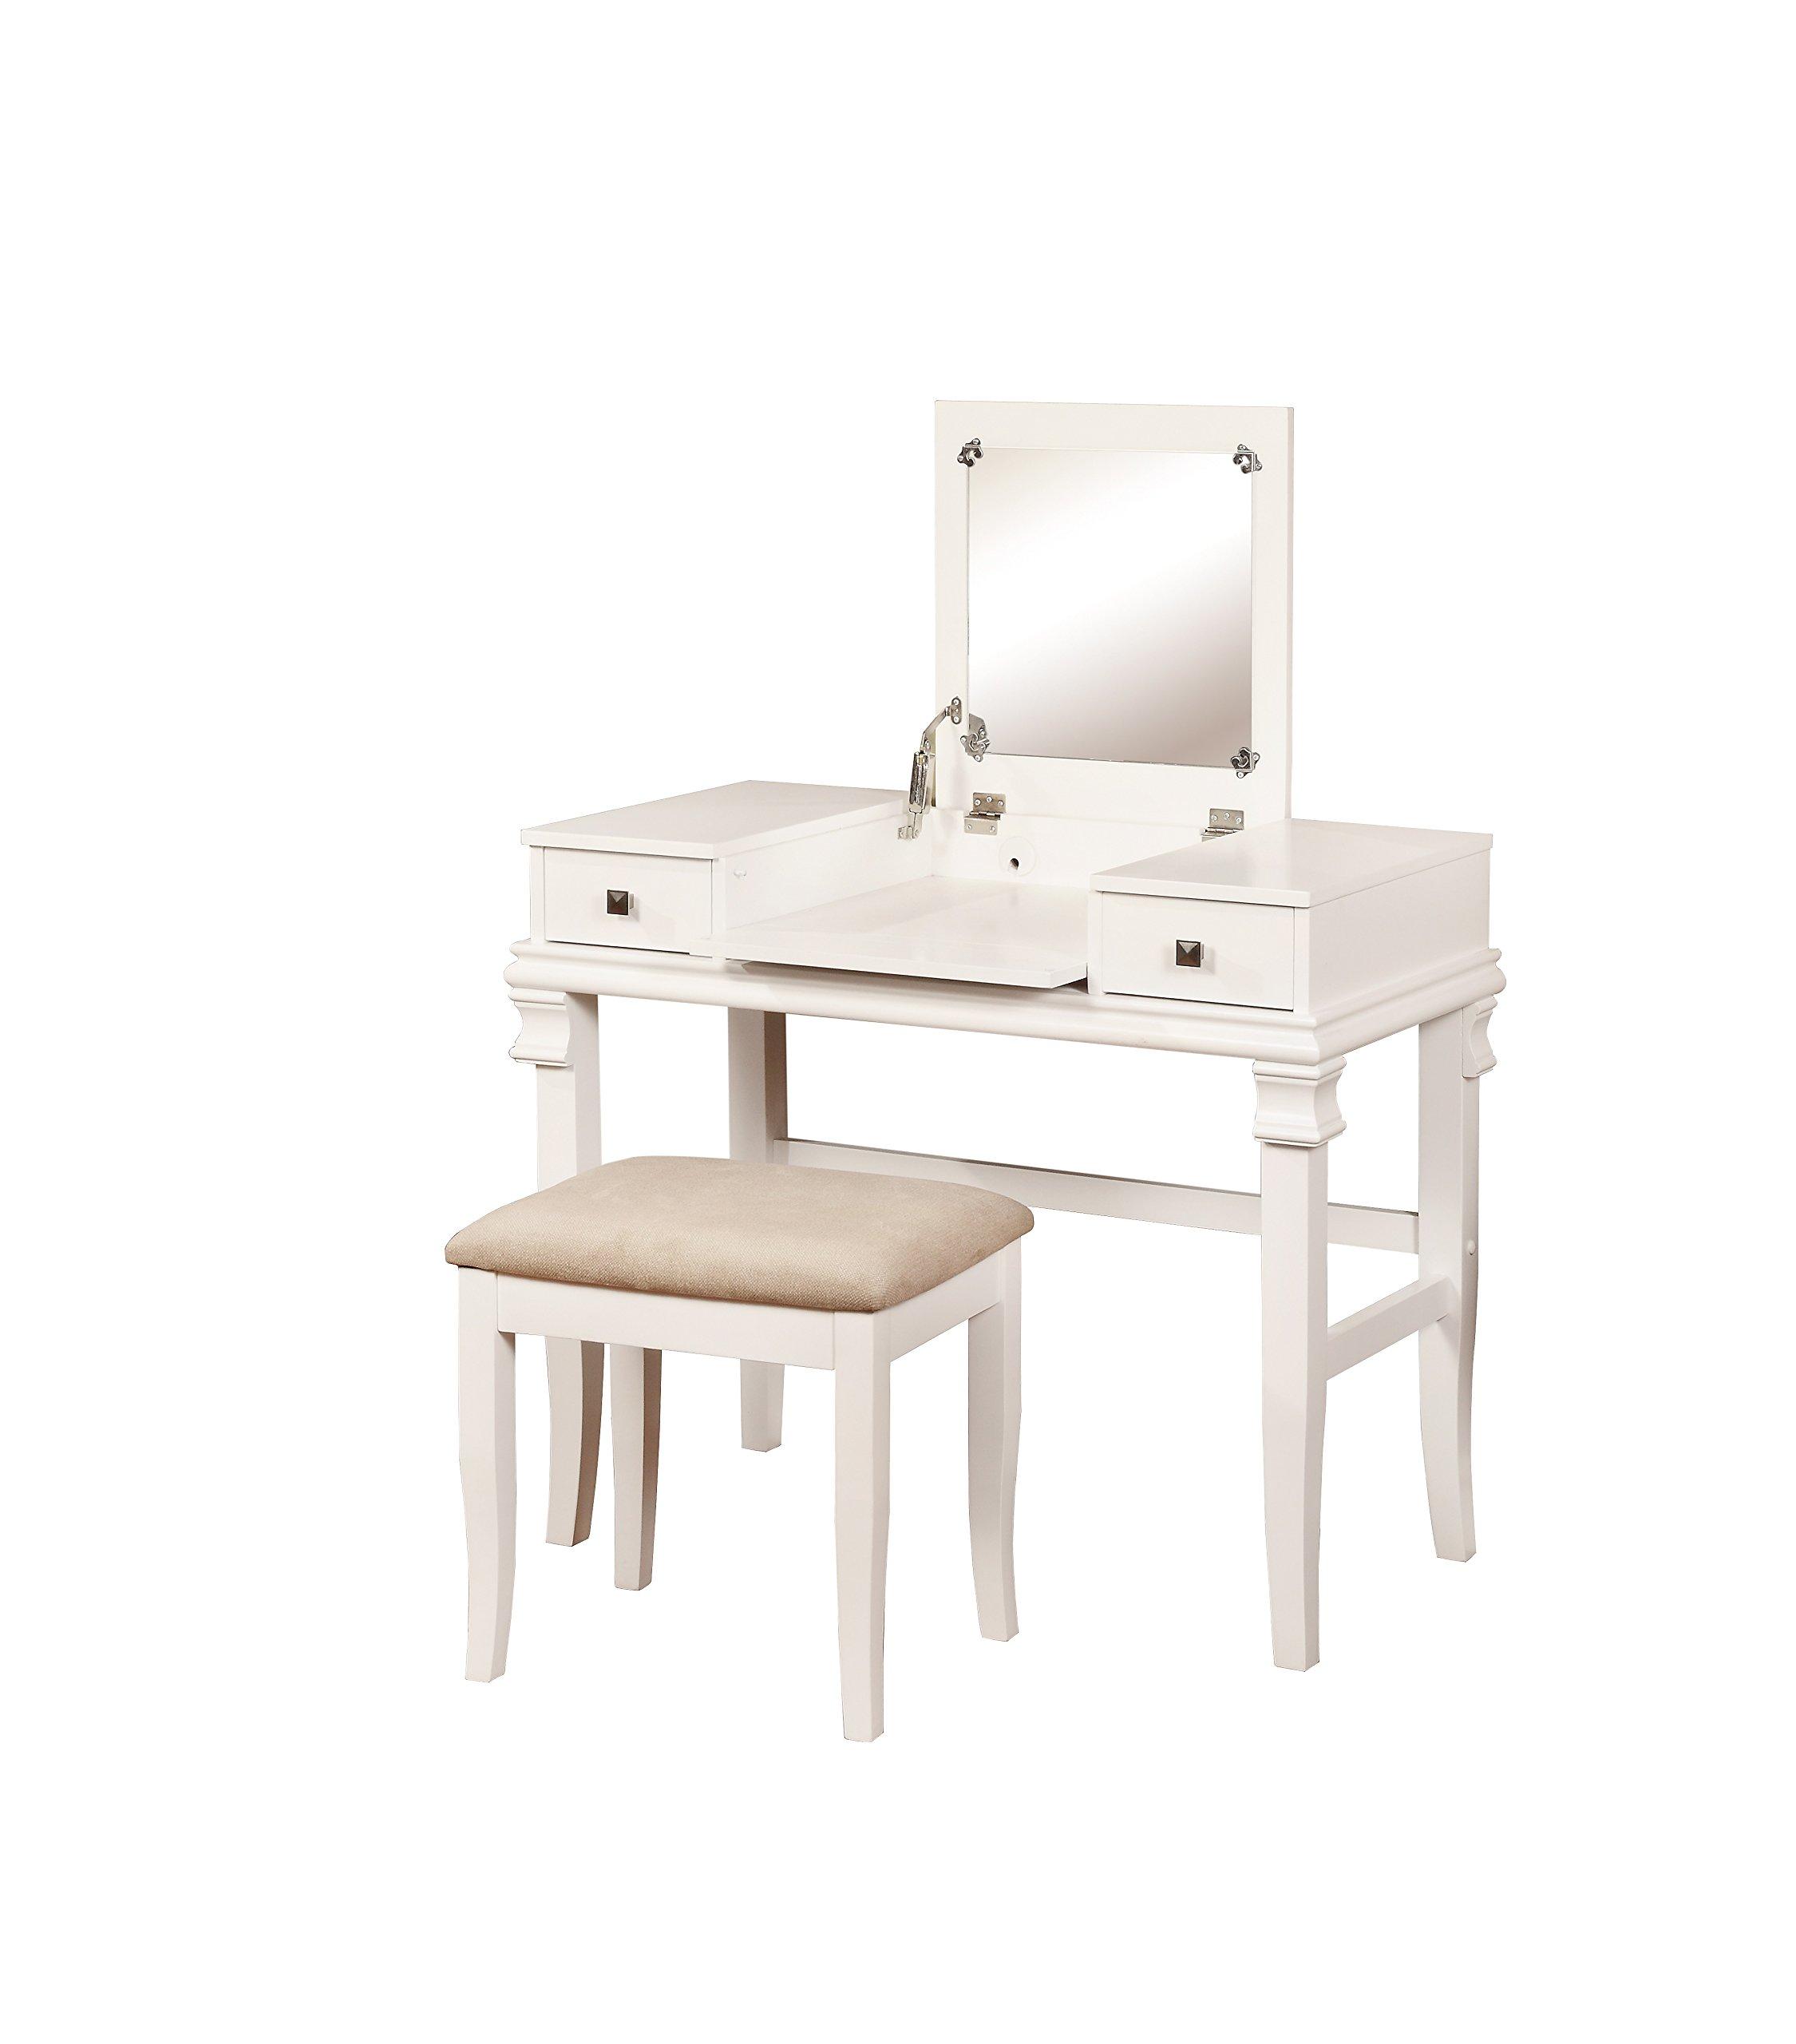 Linon 98373WHT-01-KD-U Angela Vanity Set, White, 30'' x 36'' x 18'', by Linon